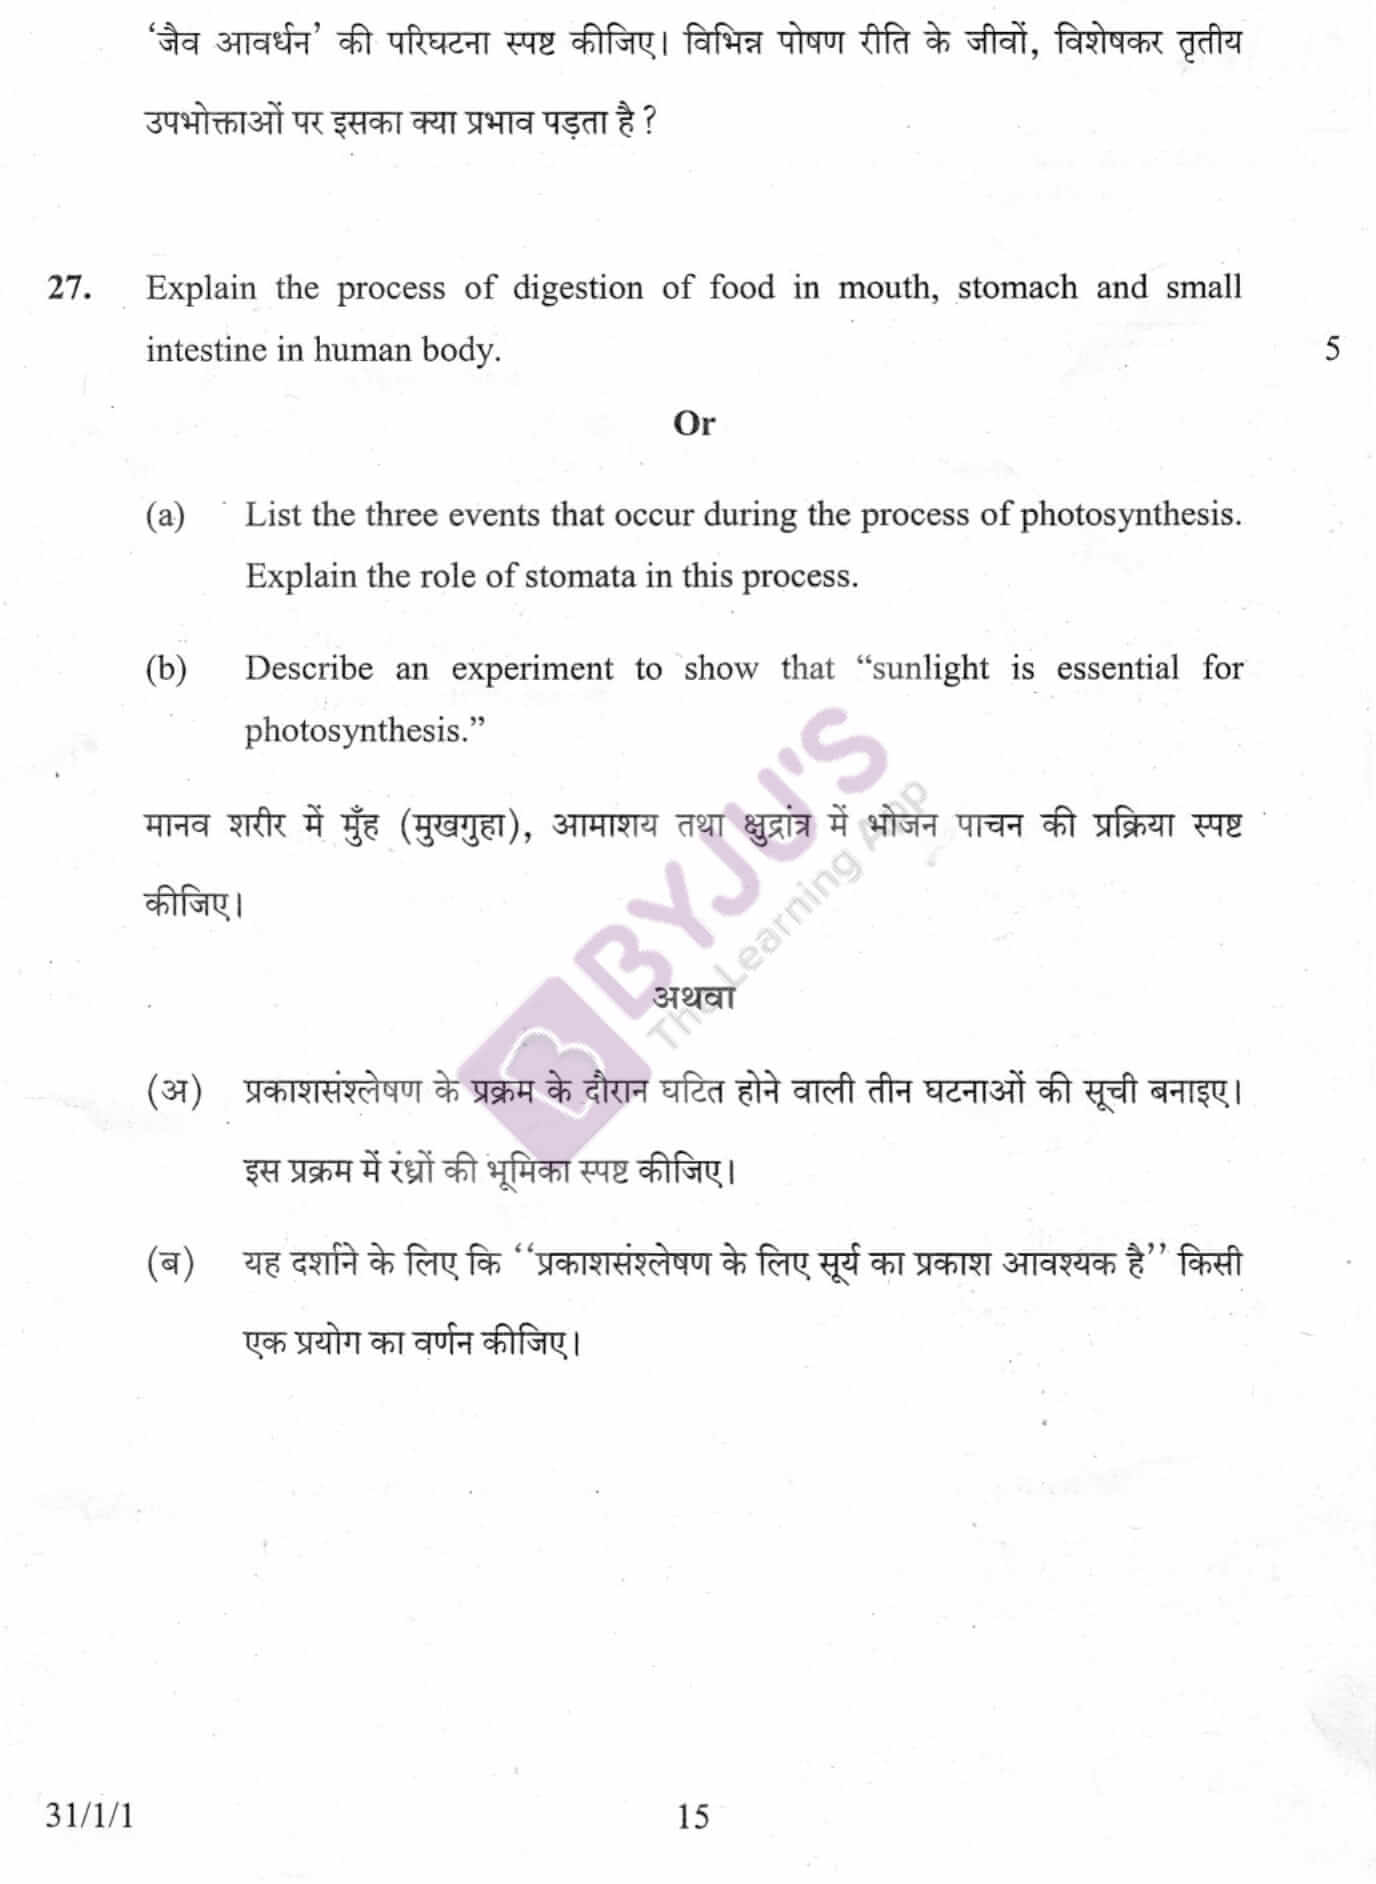 cbse class 10 science question paper 2010 set 1